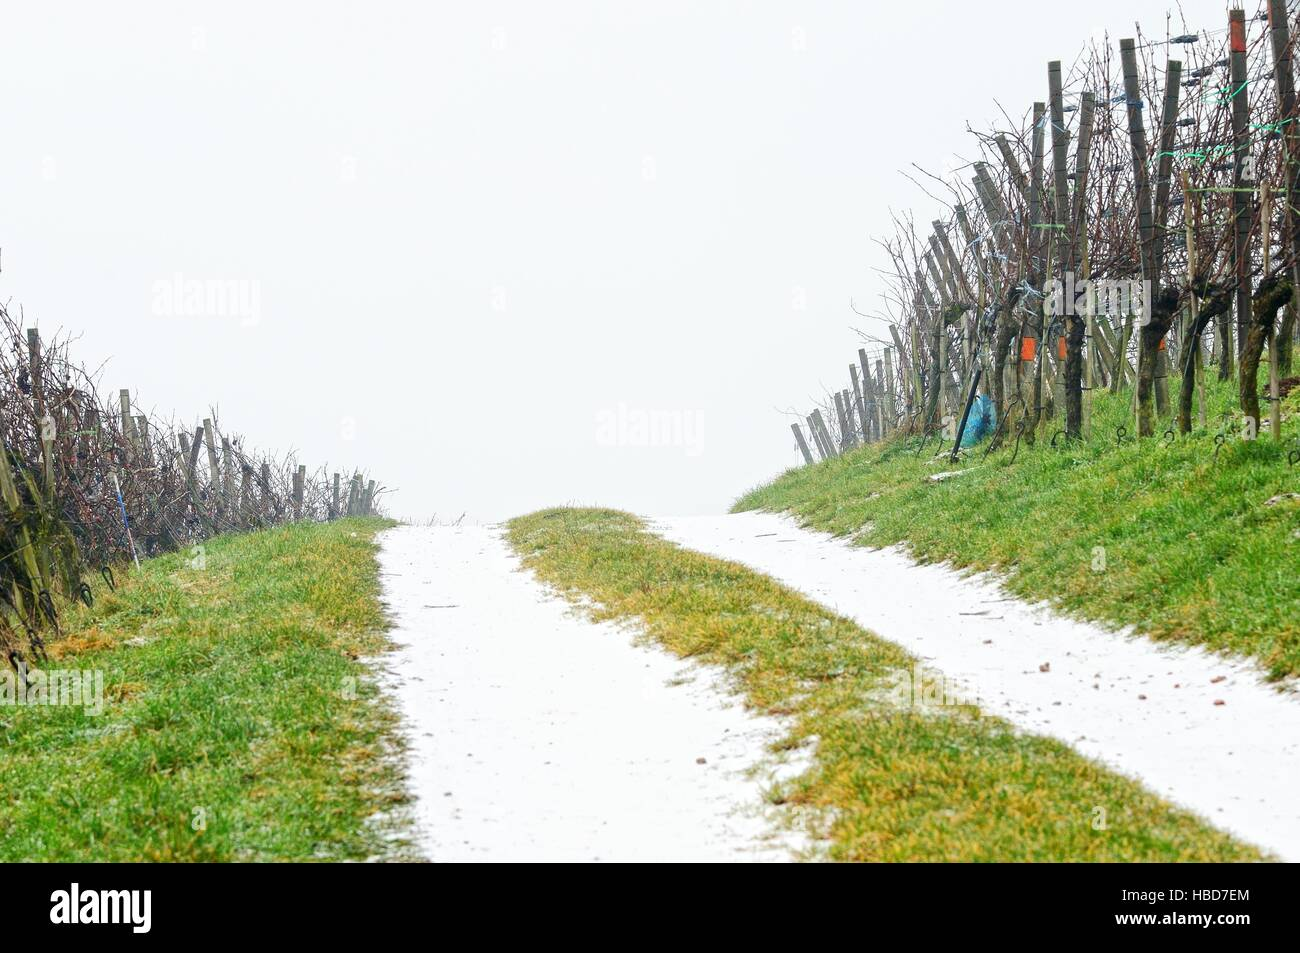 through the vineyard in winter - Stock Image